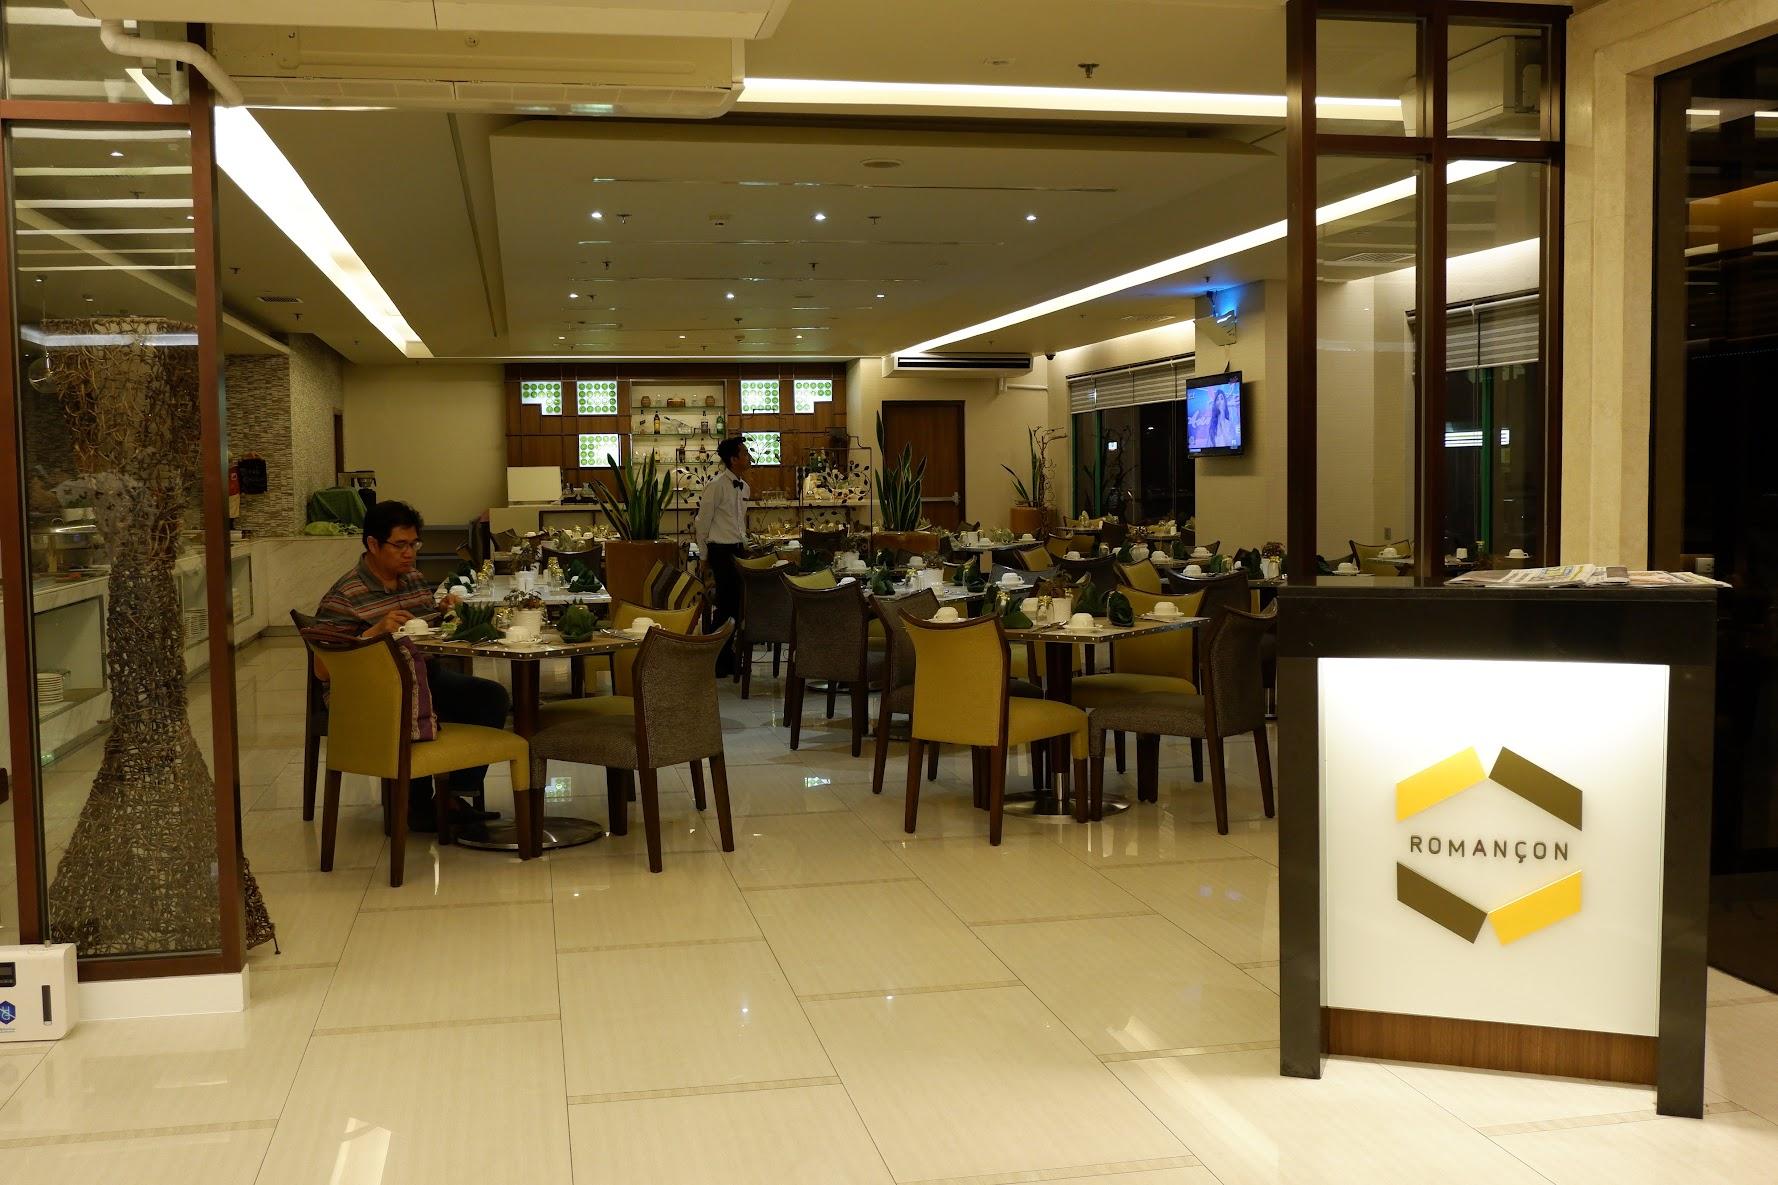 cafe romancon hotel benilde